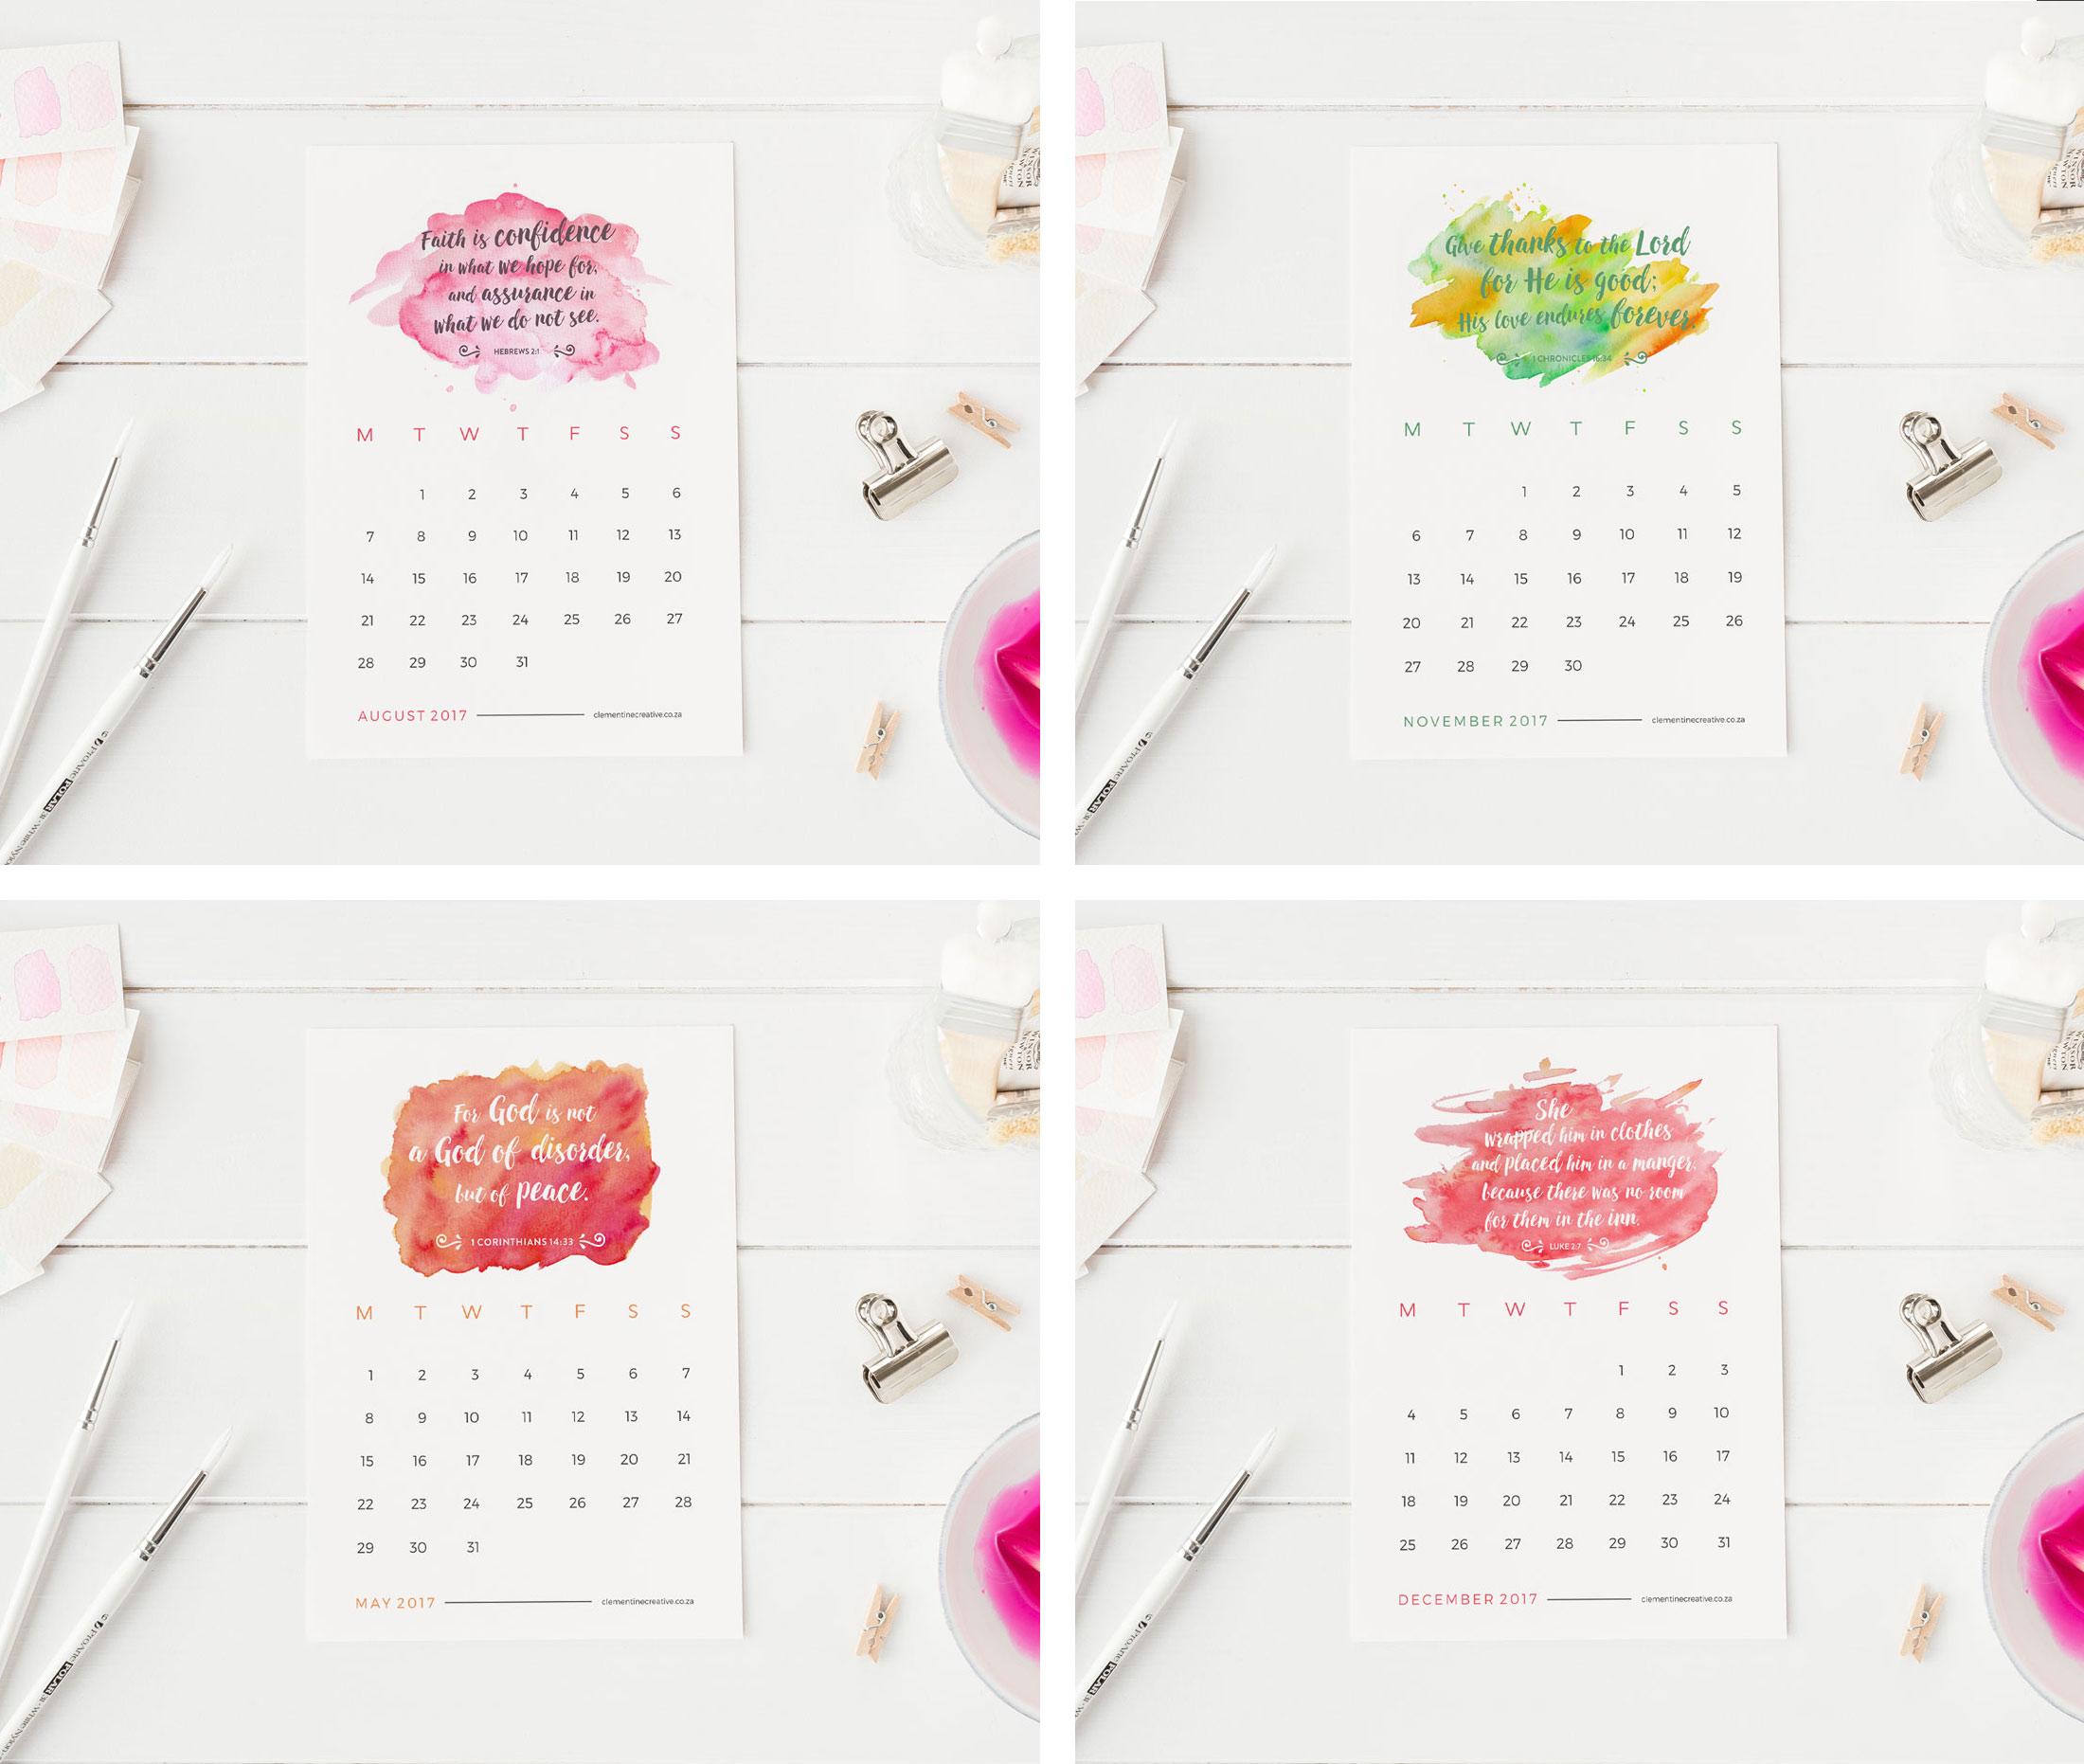 ... Printable Calendars / Printable 2017 Mini Desk Calendar – Bible